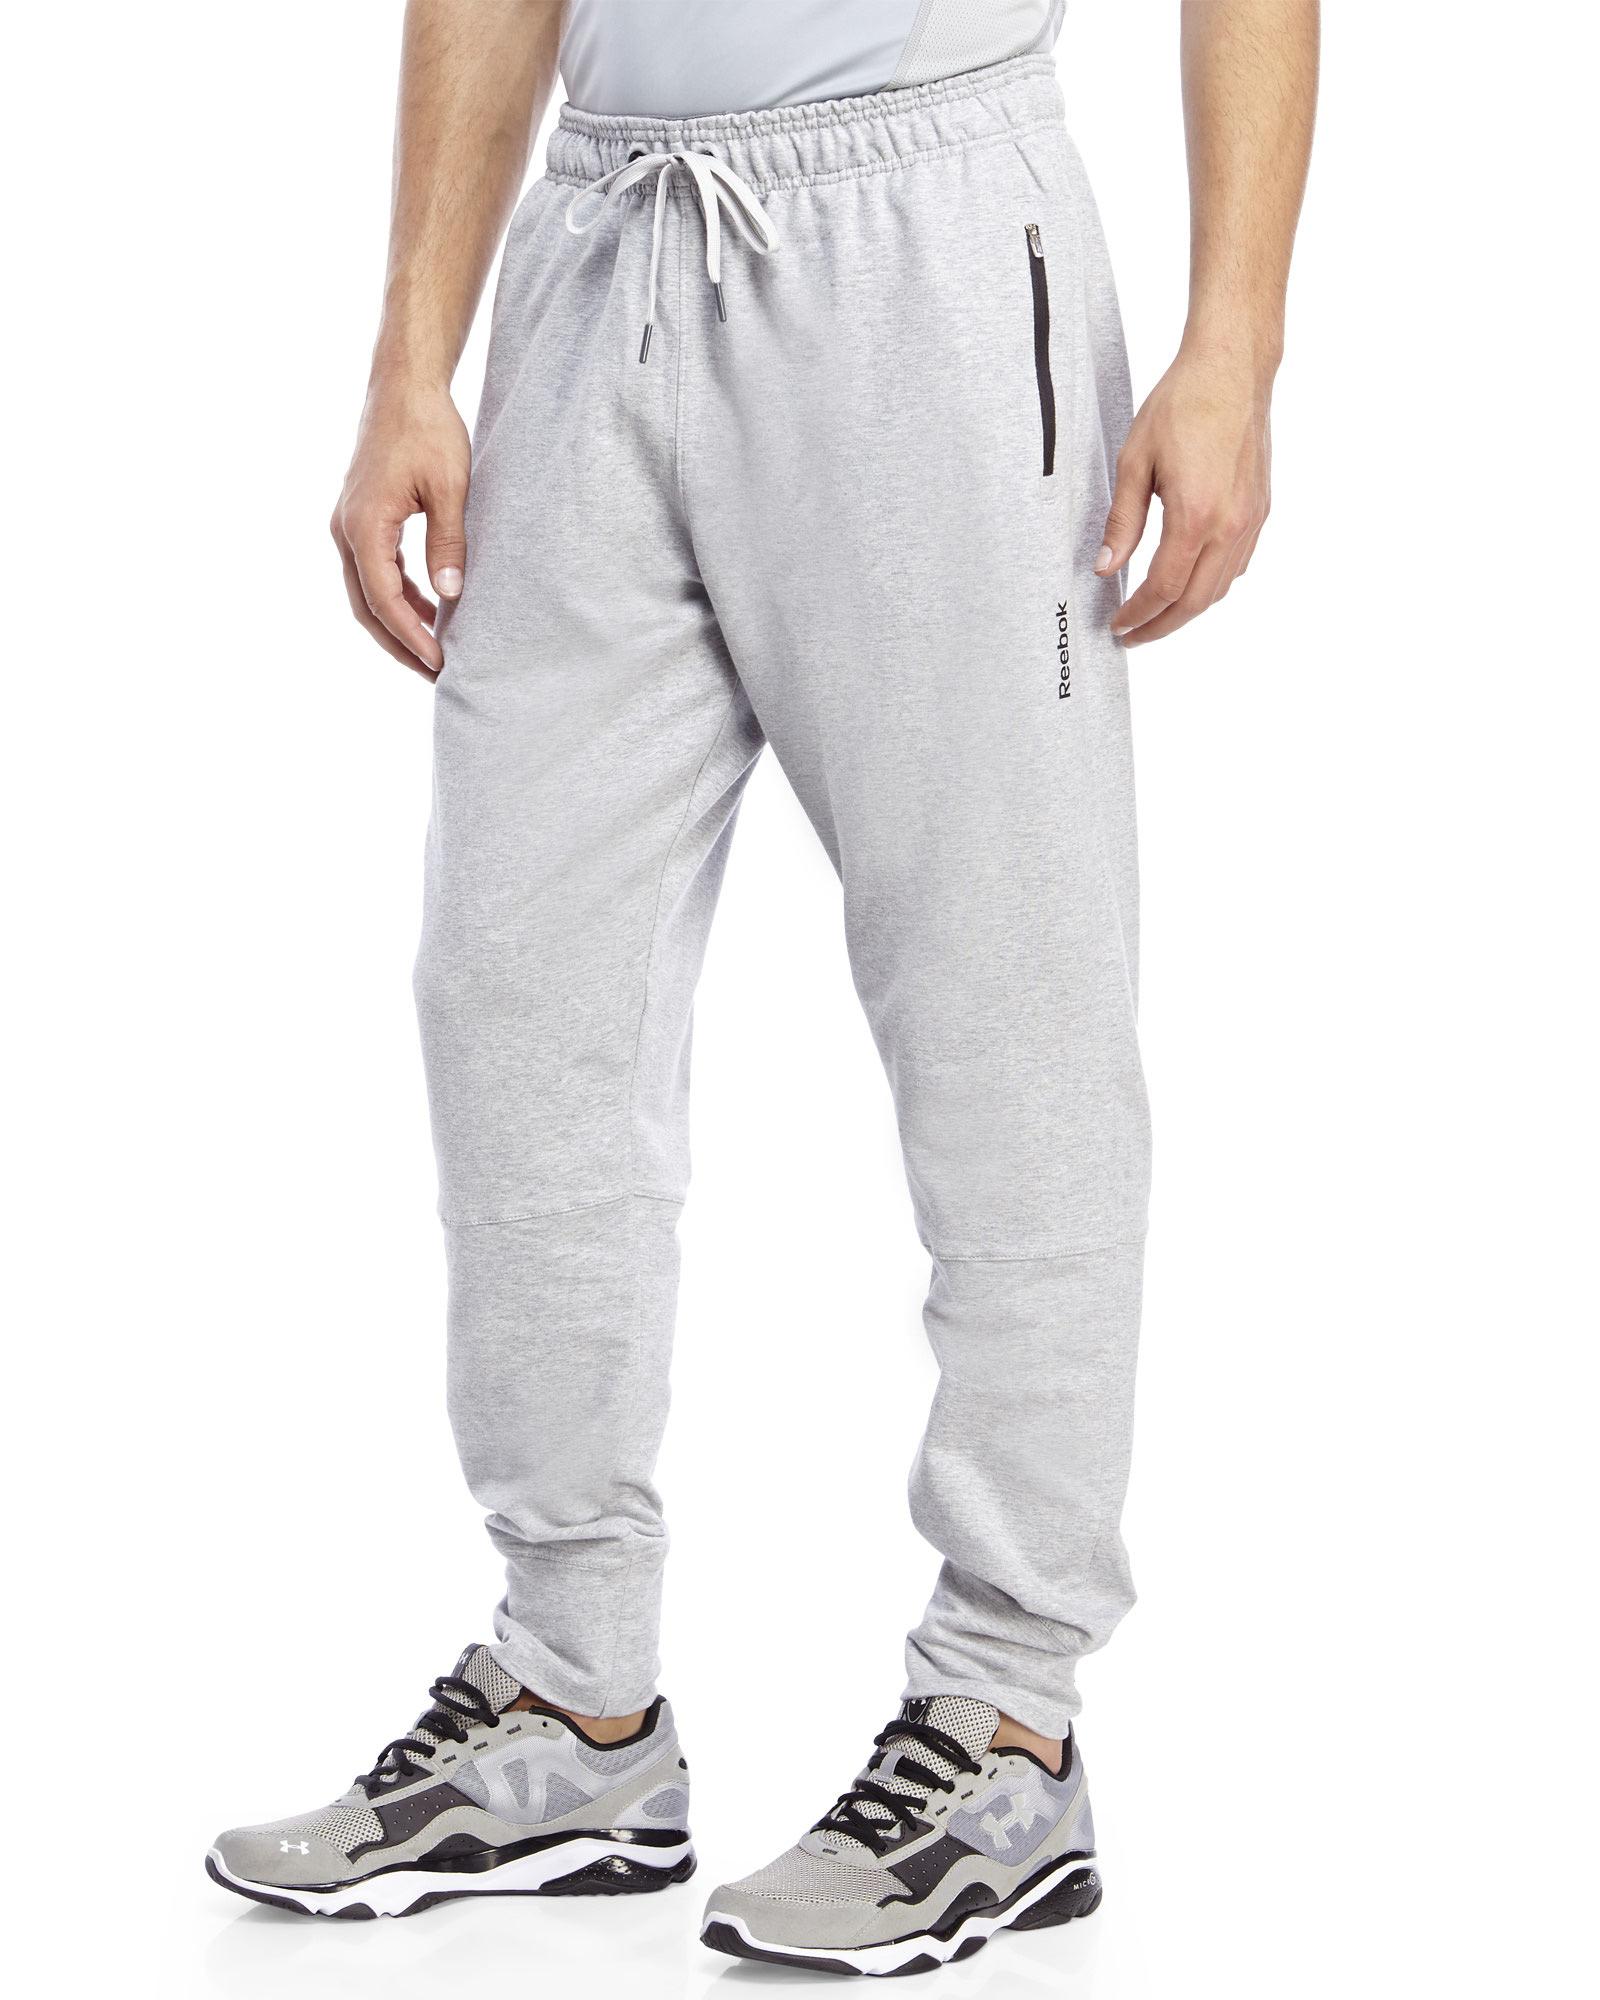 7defe74c11 Reebok Gray Double Time Sweatpants for men